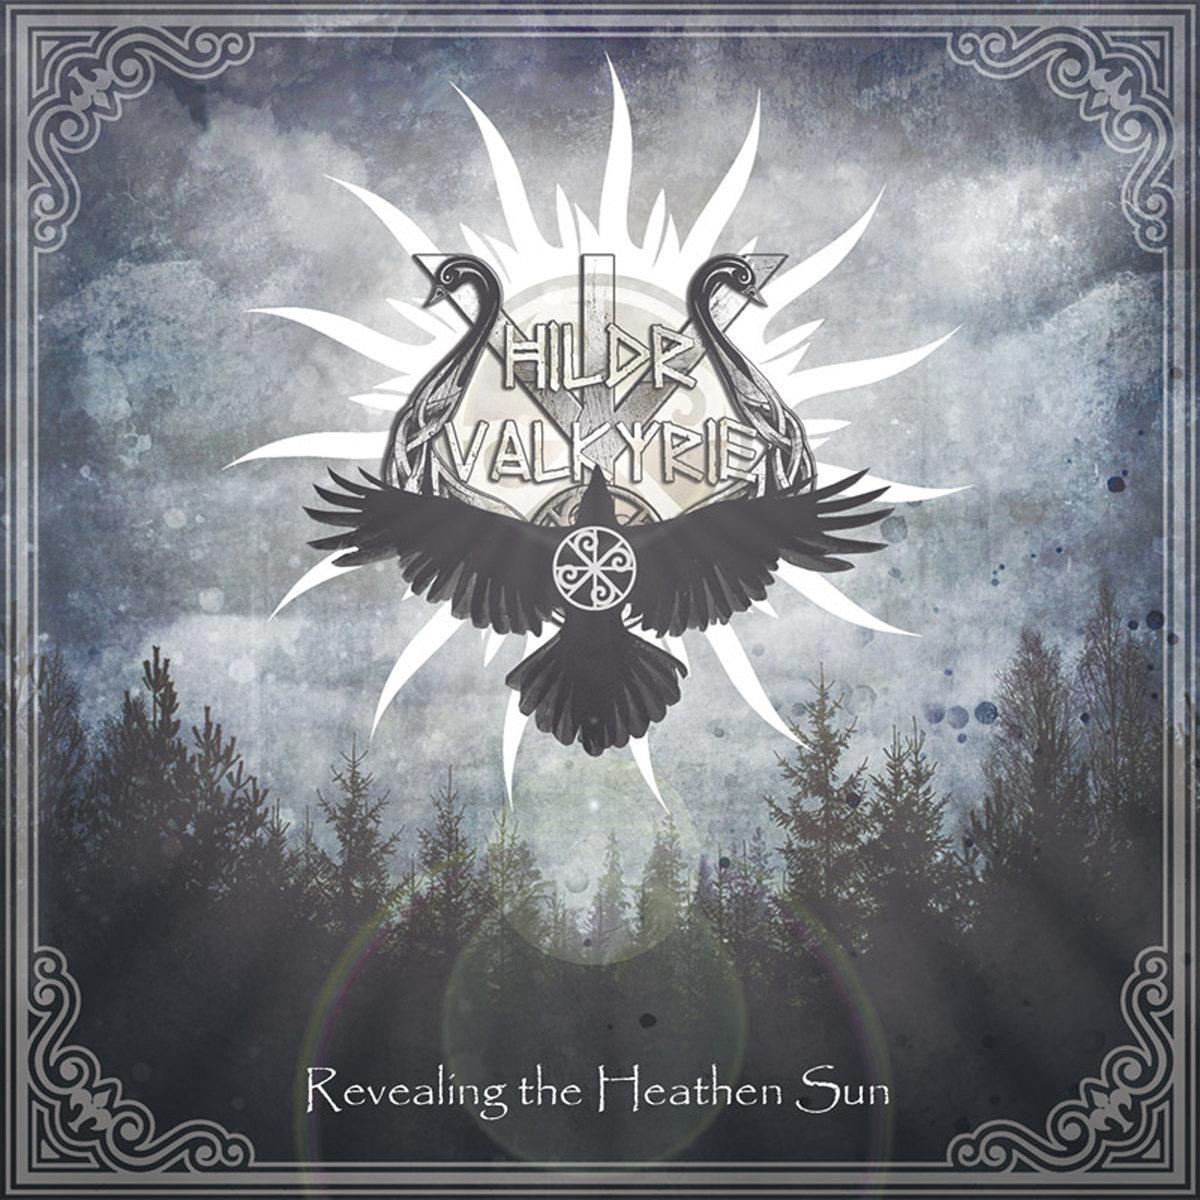 HILDR VALKYRIE - Revealing The Heathen Sun CD | Possession